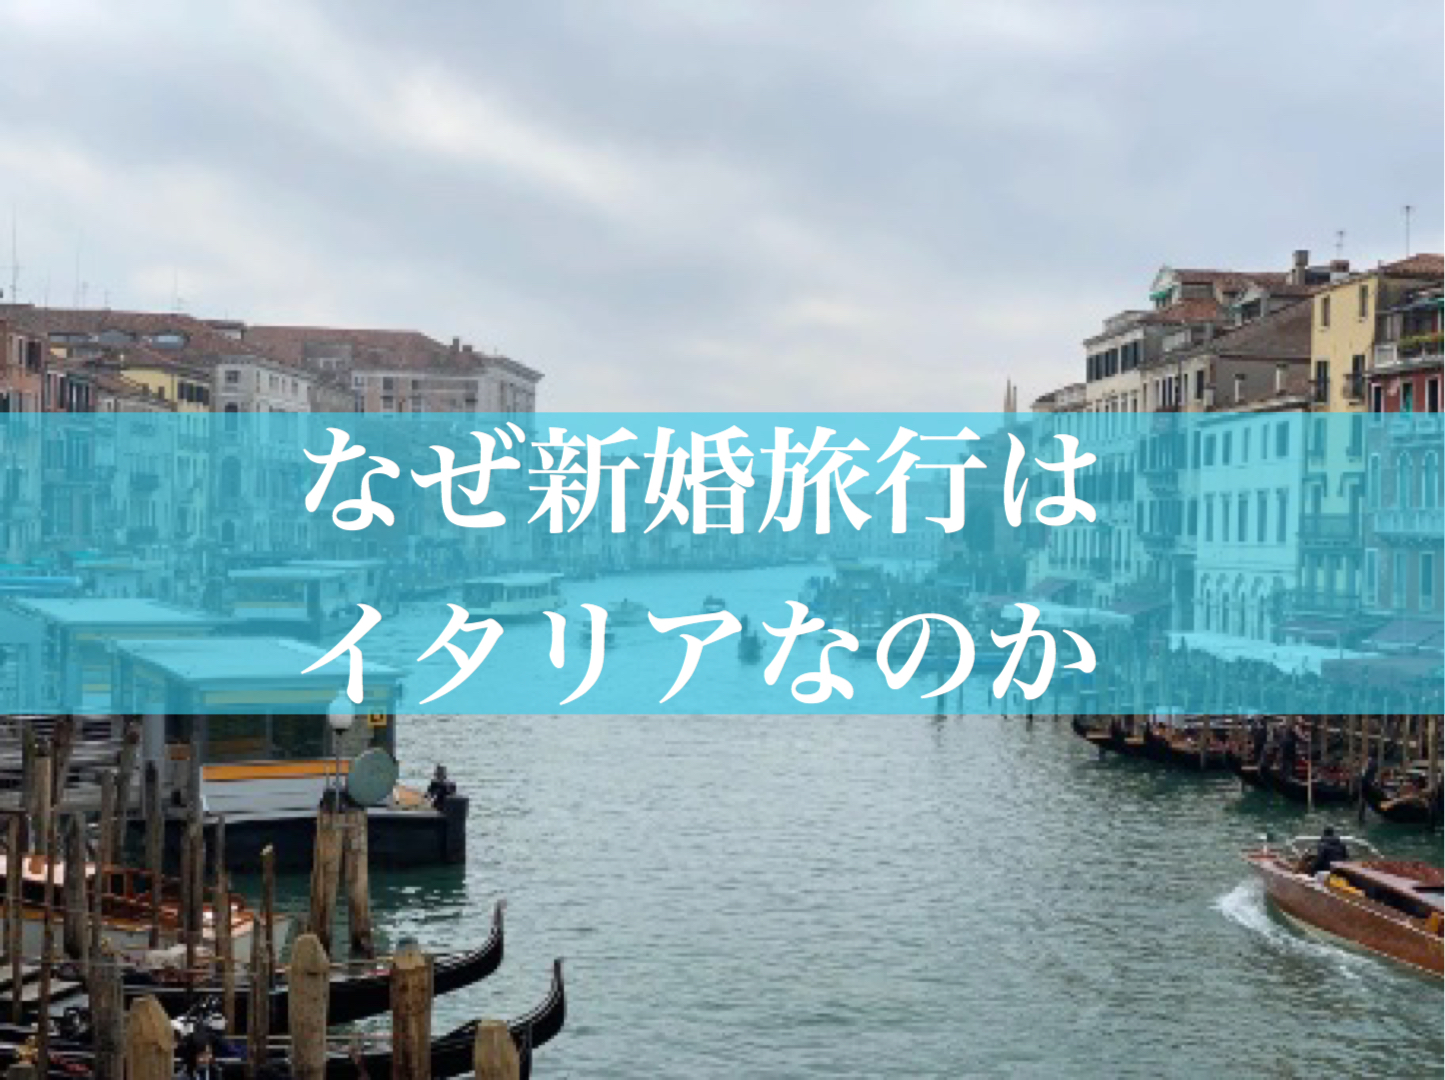 HISの人気ツアー『憧れのイタリア周遊8日間』感想2019